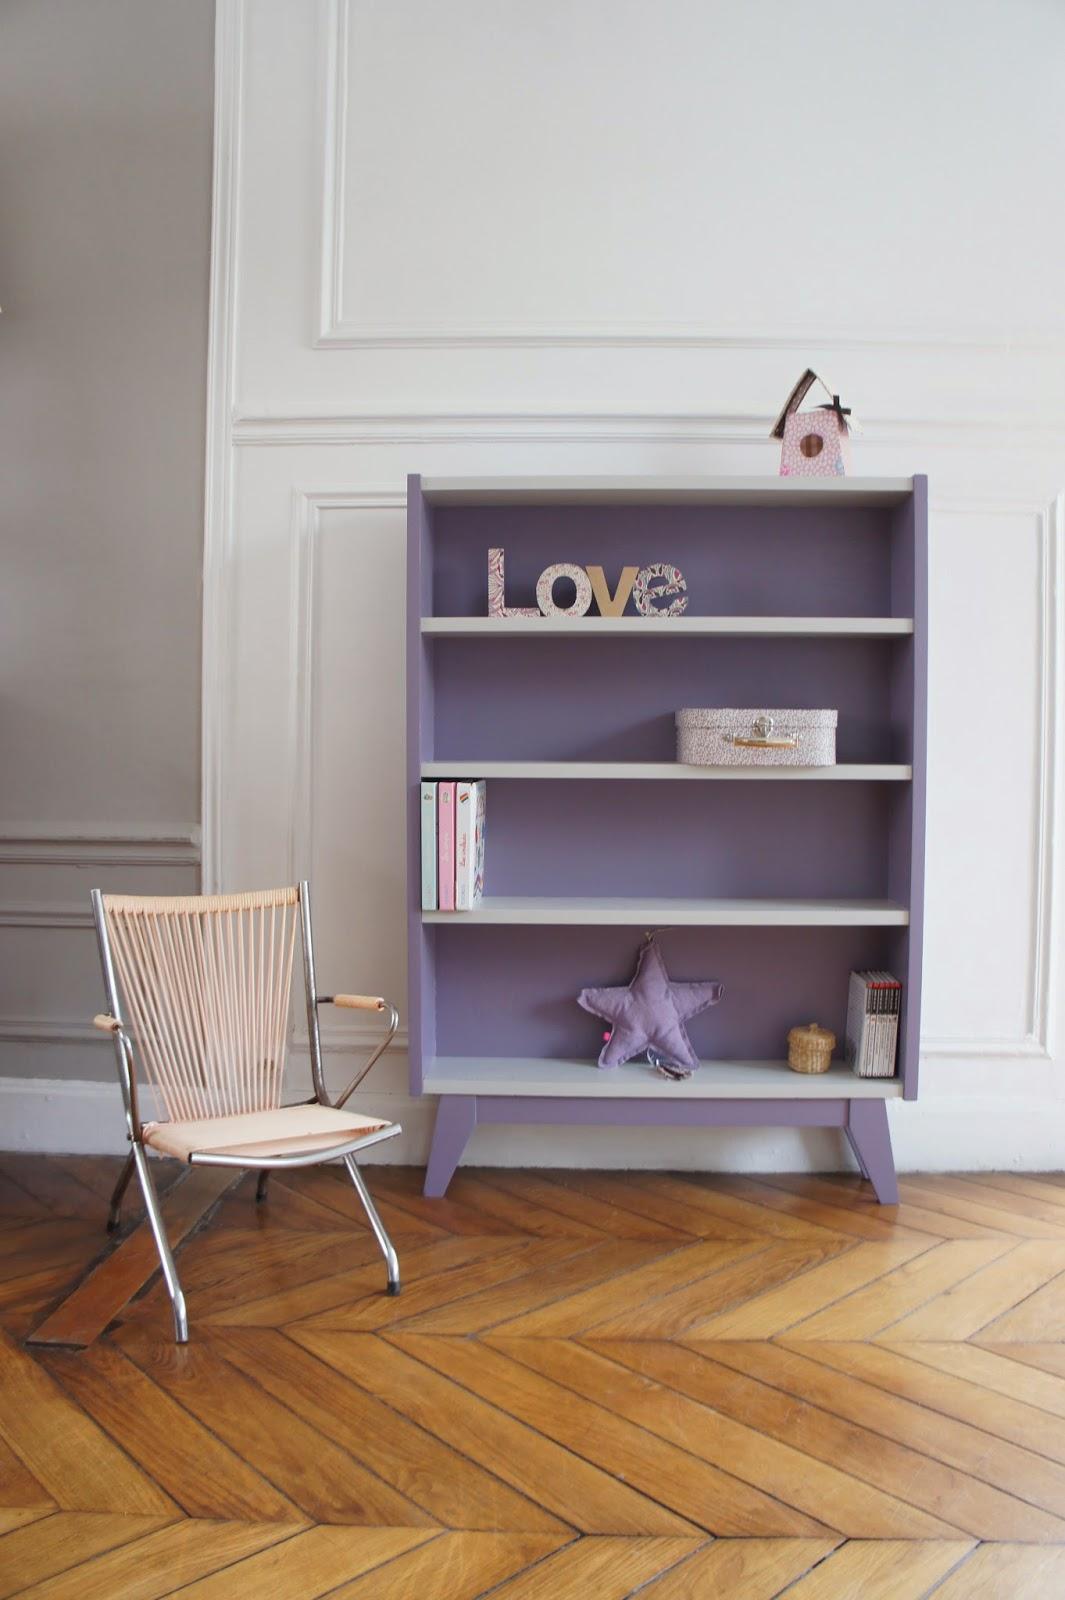 bibliothque petite profondeur gallery of lack tagre with bibliothque petite profondeur simple. Black Bedroom Furniture Sets. Home Design Ideas